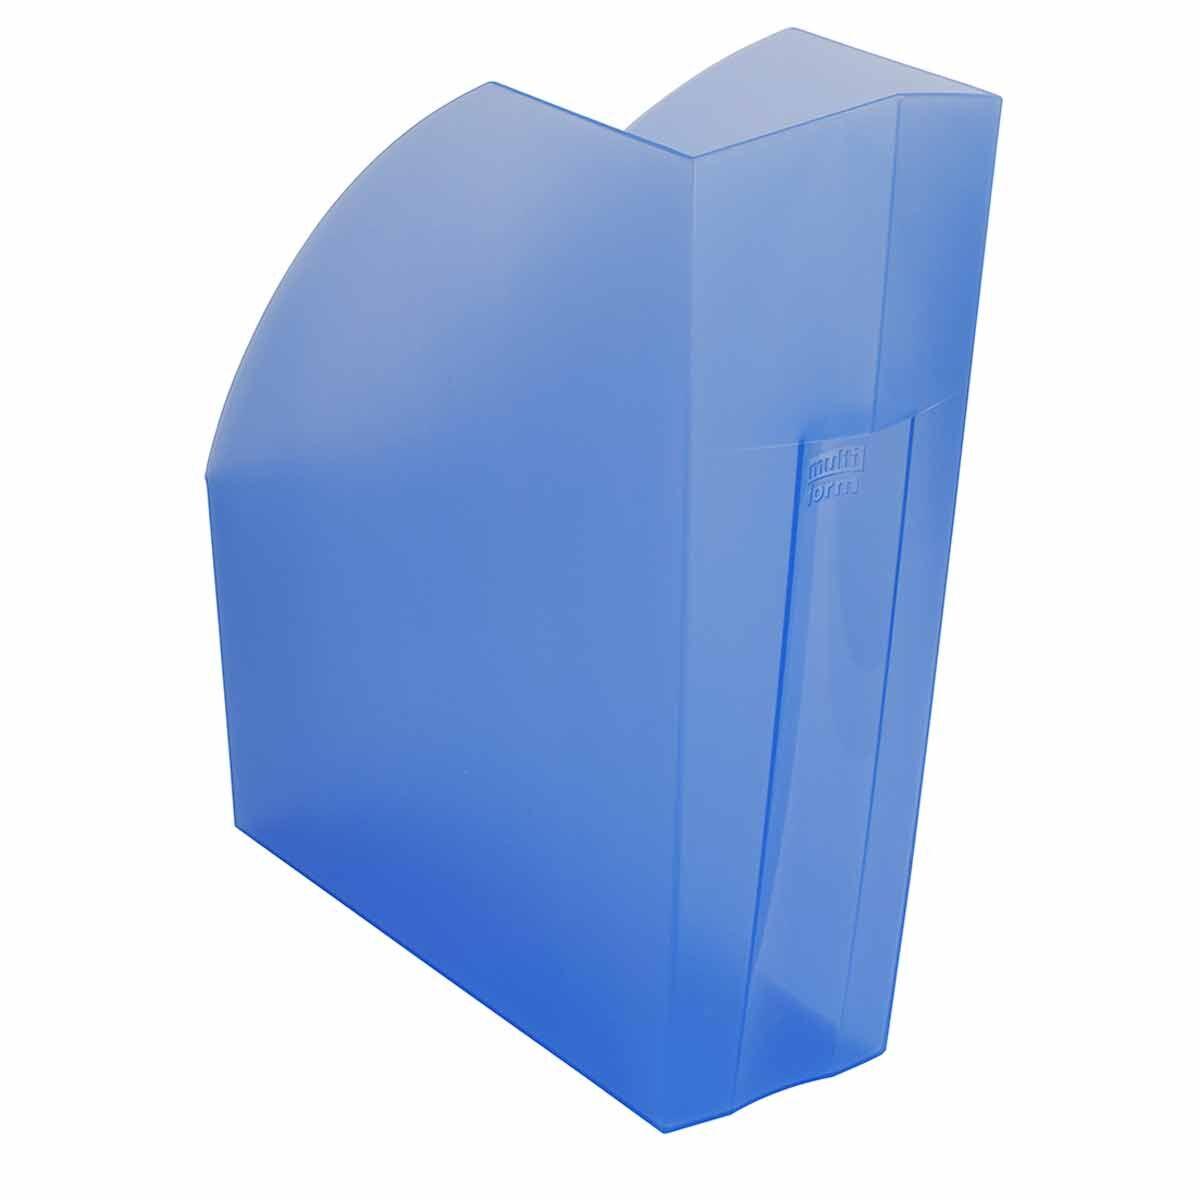 Exacompta Linicolor Magazine File Pack of 3 Ice Blue